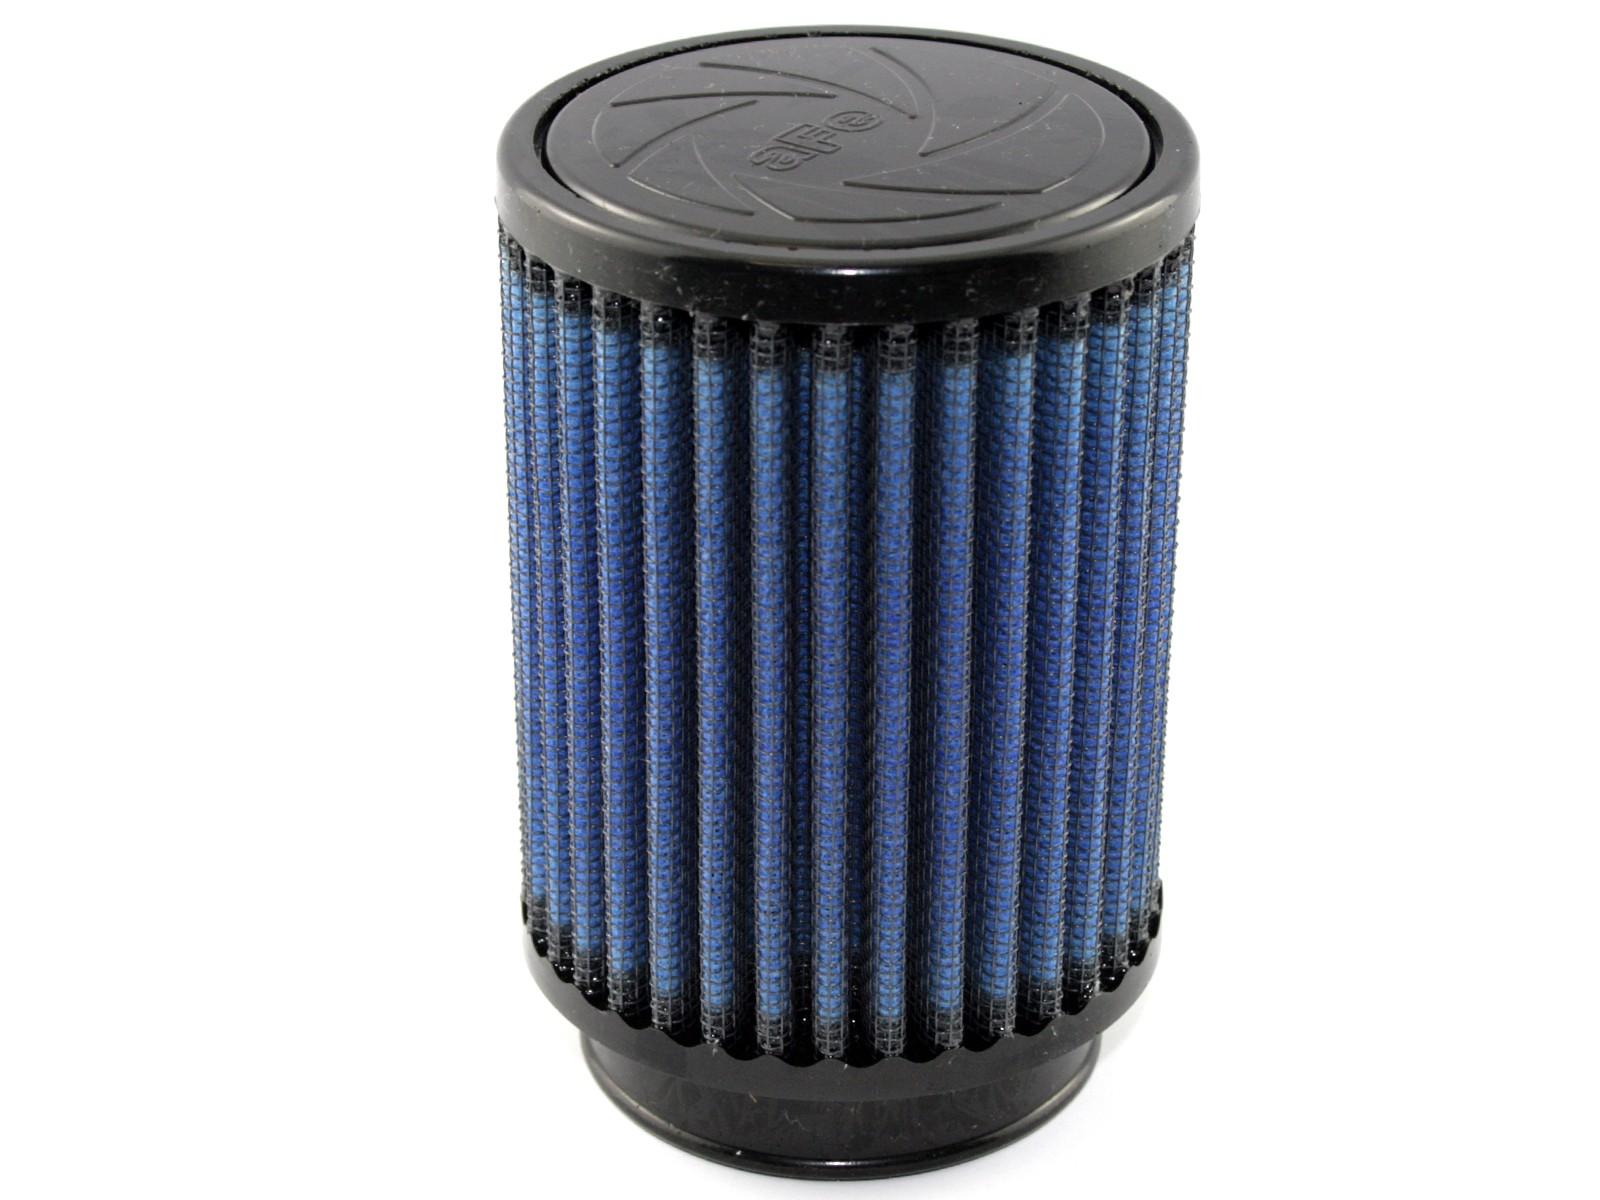 aFe POWER 24-20504 Magnum FLOW Pro 5R Air Filter